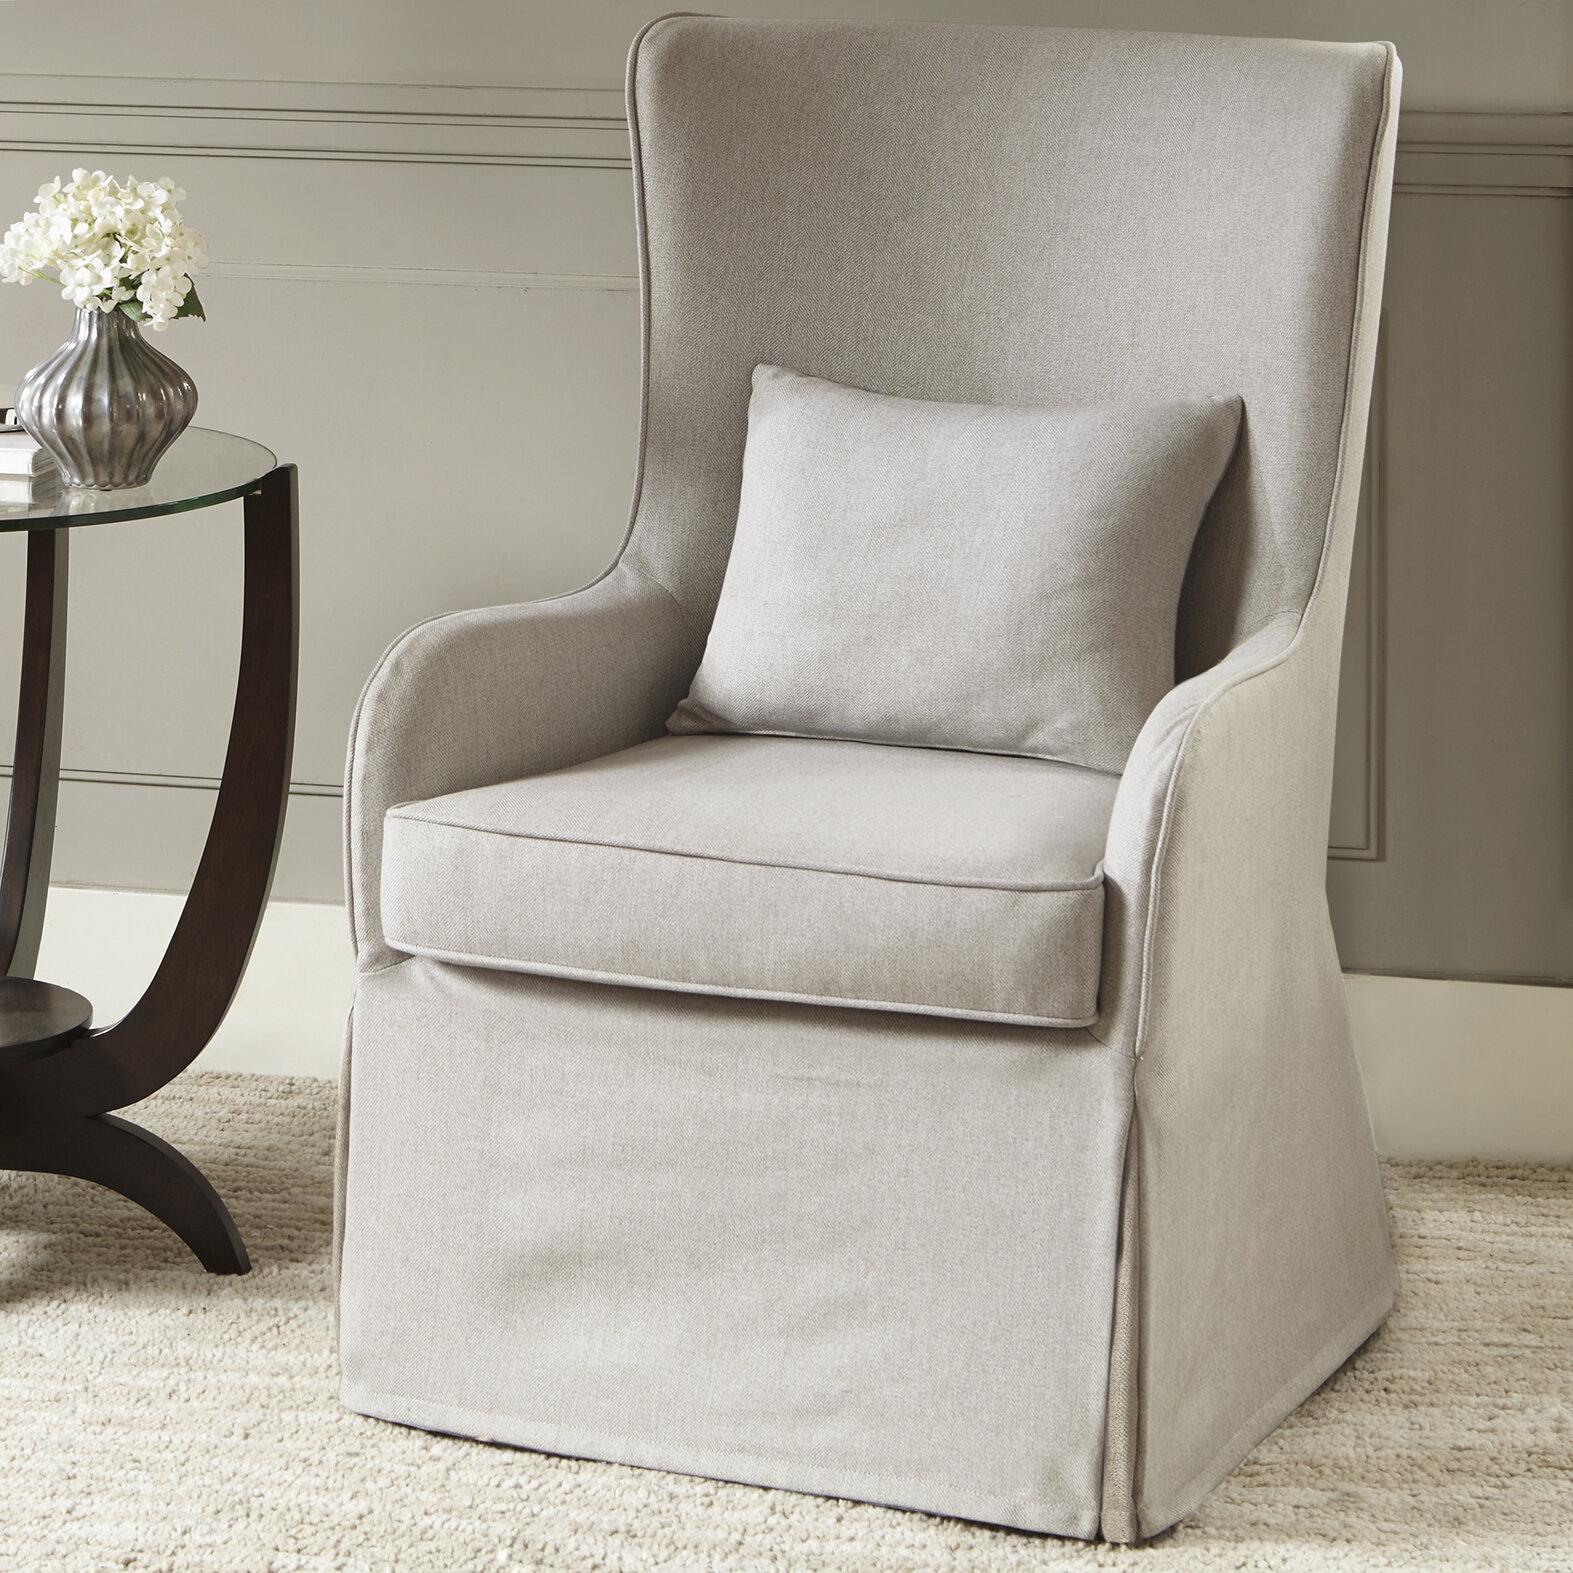 Regis Wingback Chair Regarding Lauretta Velvet Wingback Chairs (View 12 of 15)